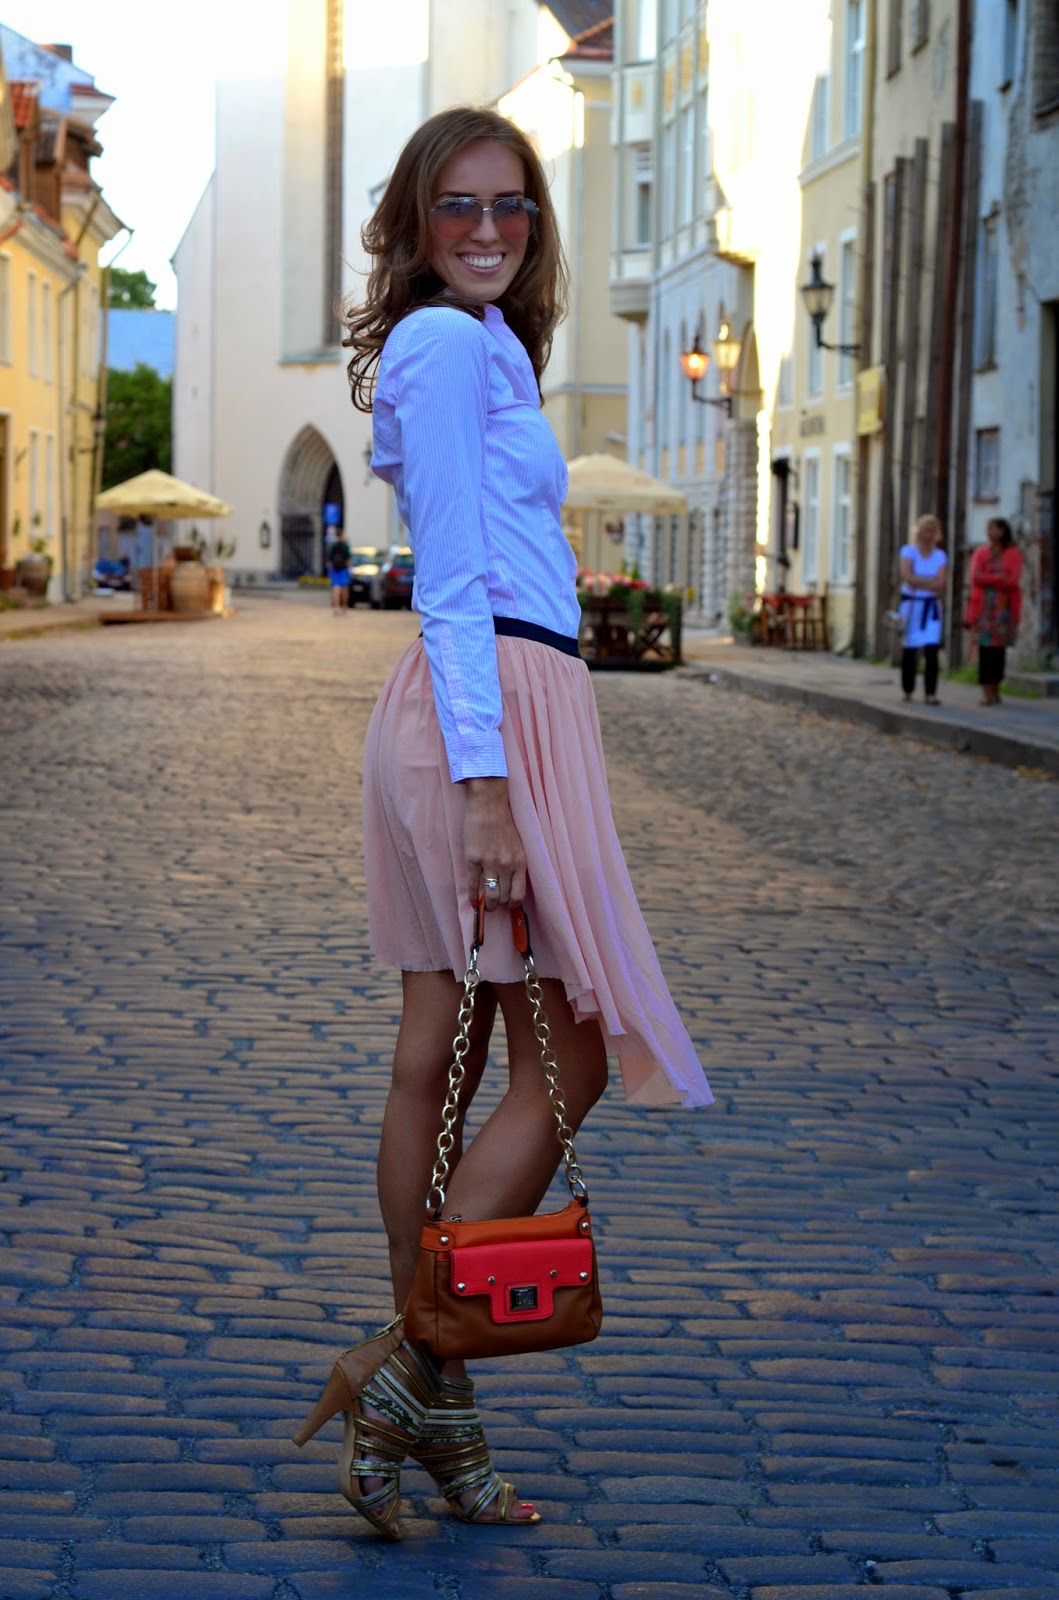 hm striped shirt bershka skirt mango sunglasses